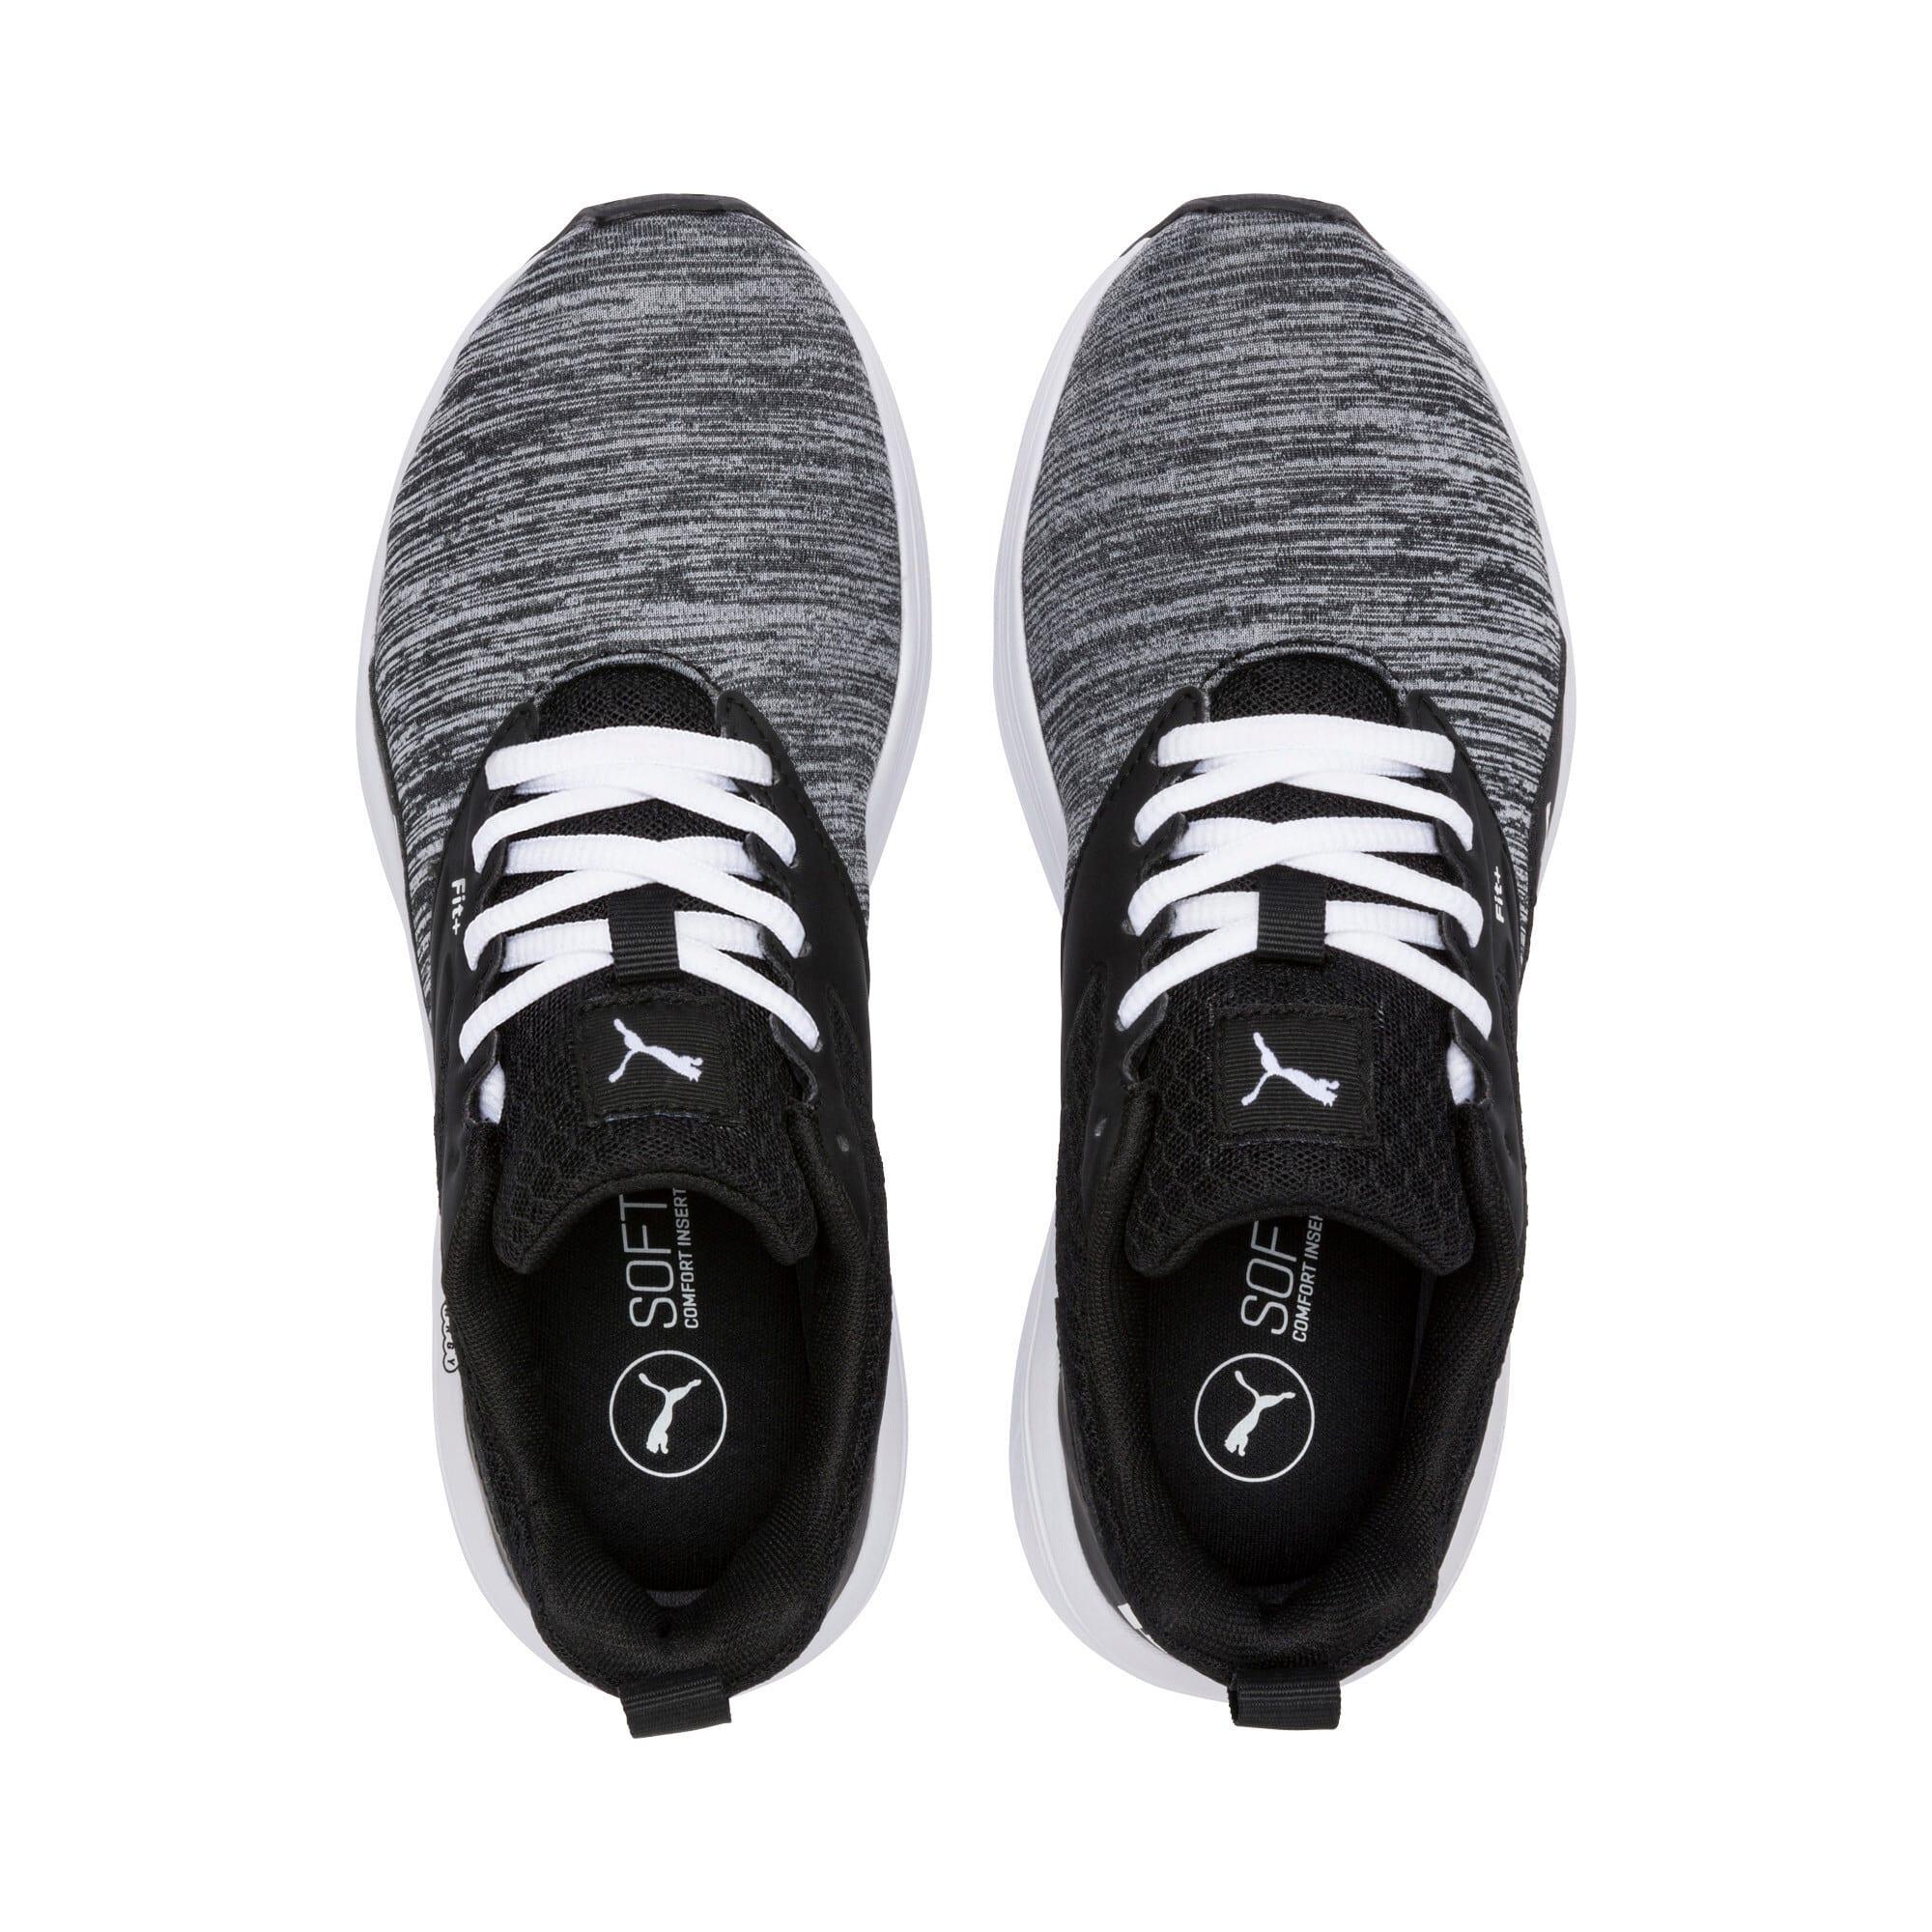 Thumbnail 2 of NRGY Comet Kids' Training Shoes, Puma White-Puma Black, medium-IND